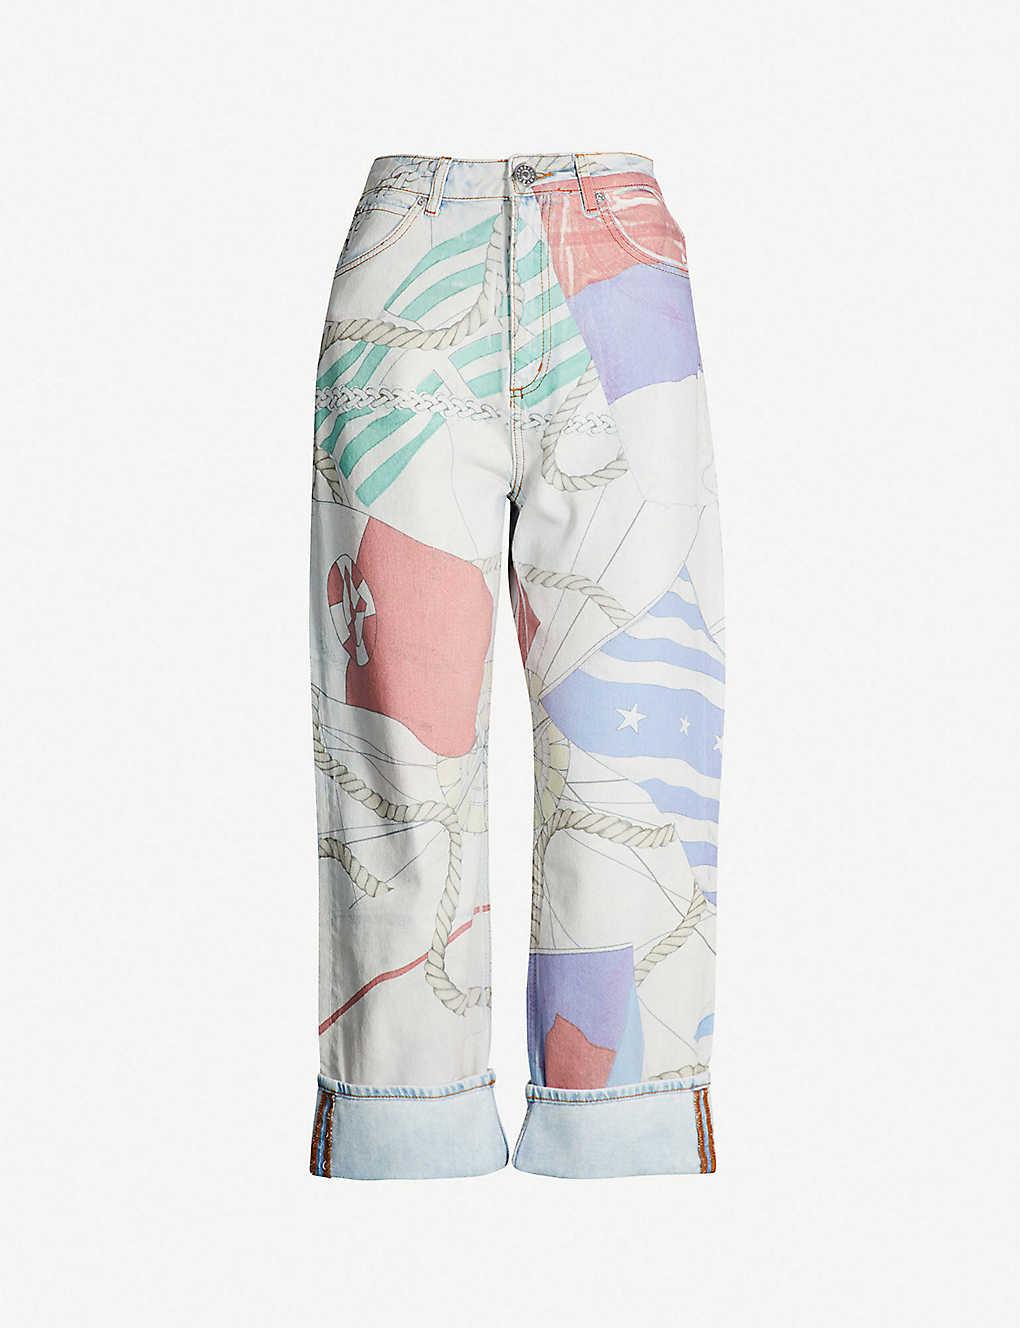 8ed254370b Wide-leg rope-print faded jeans